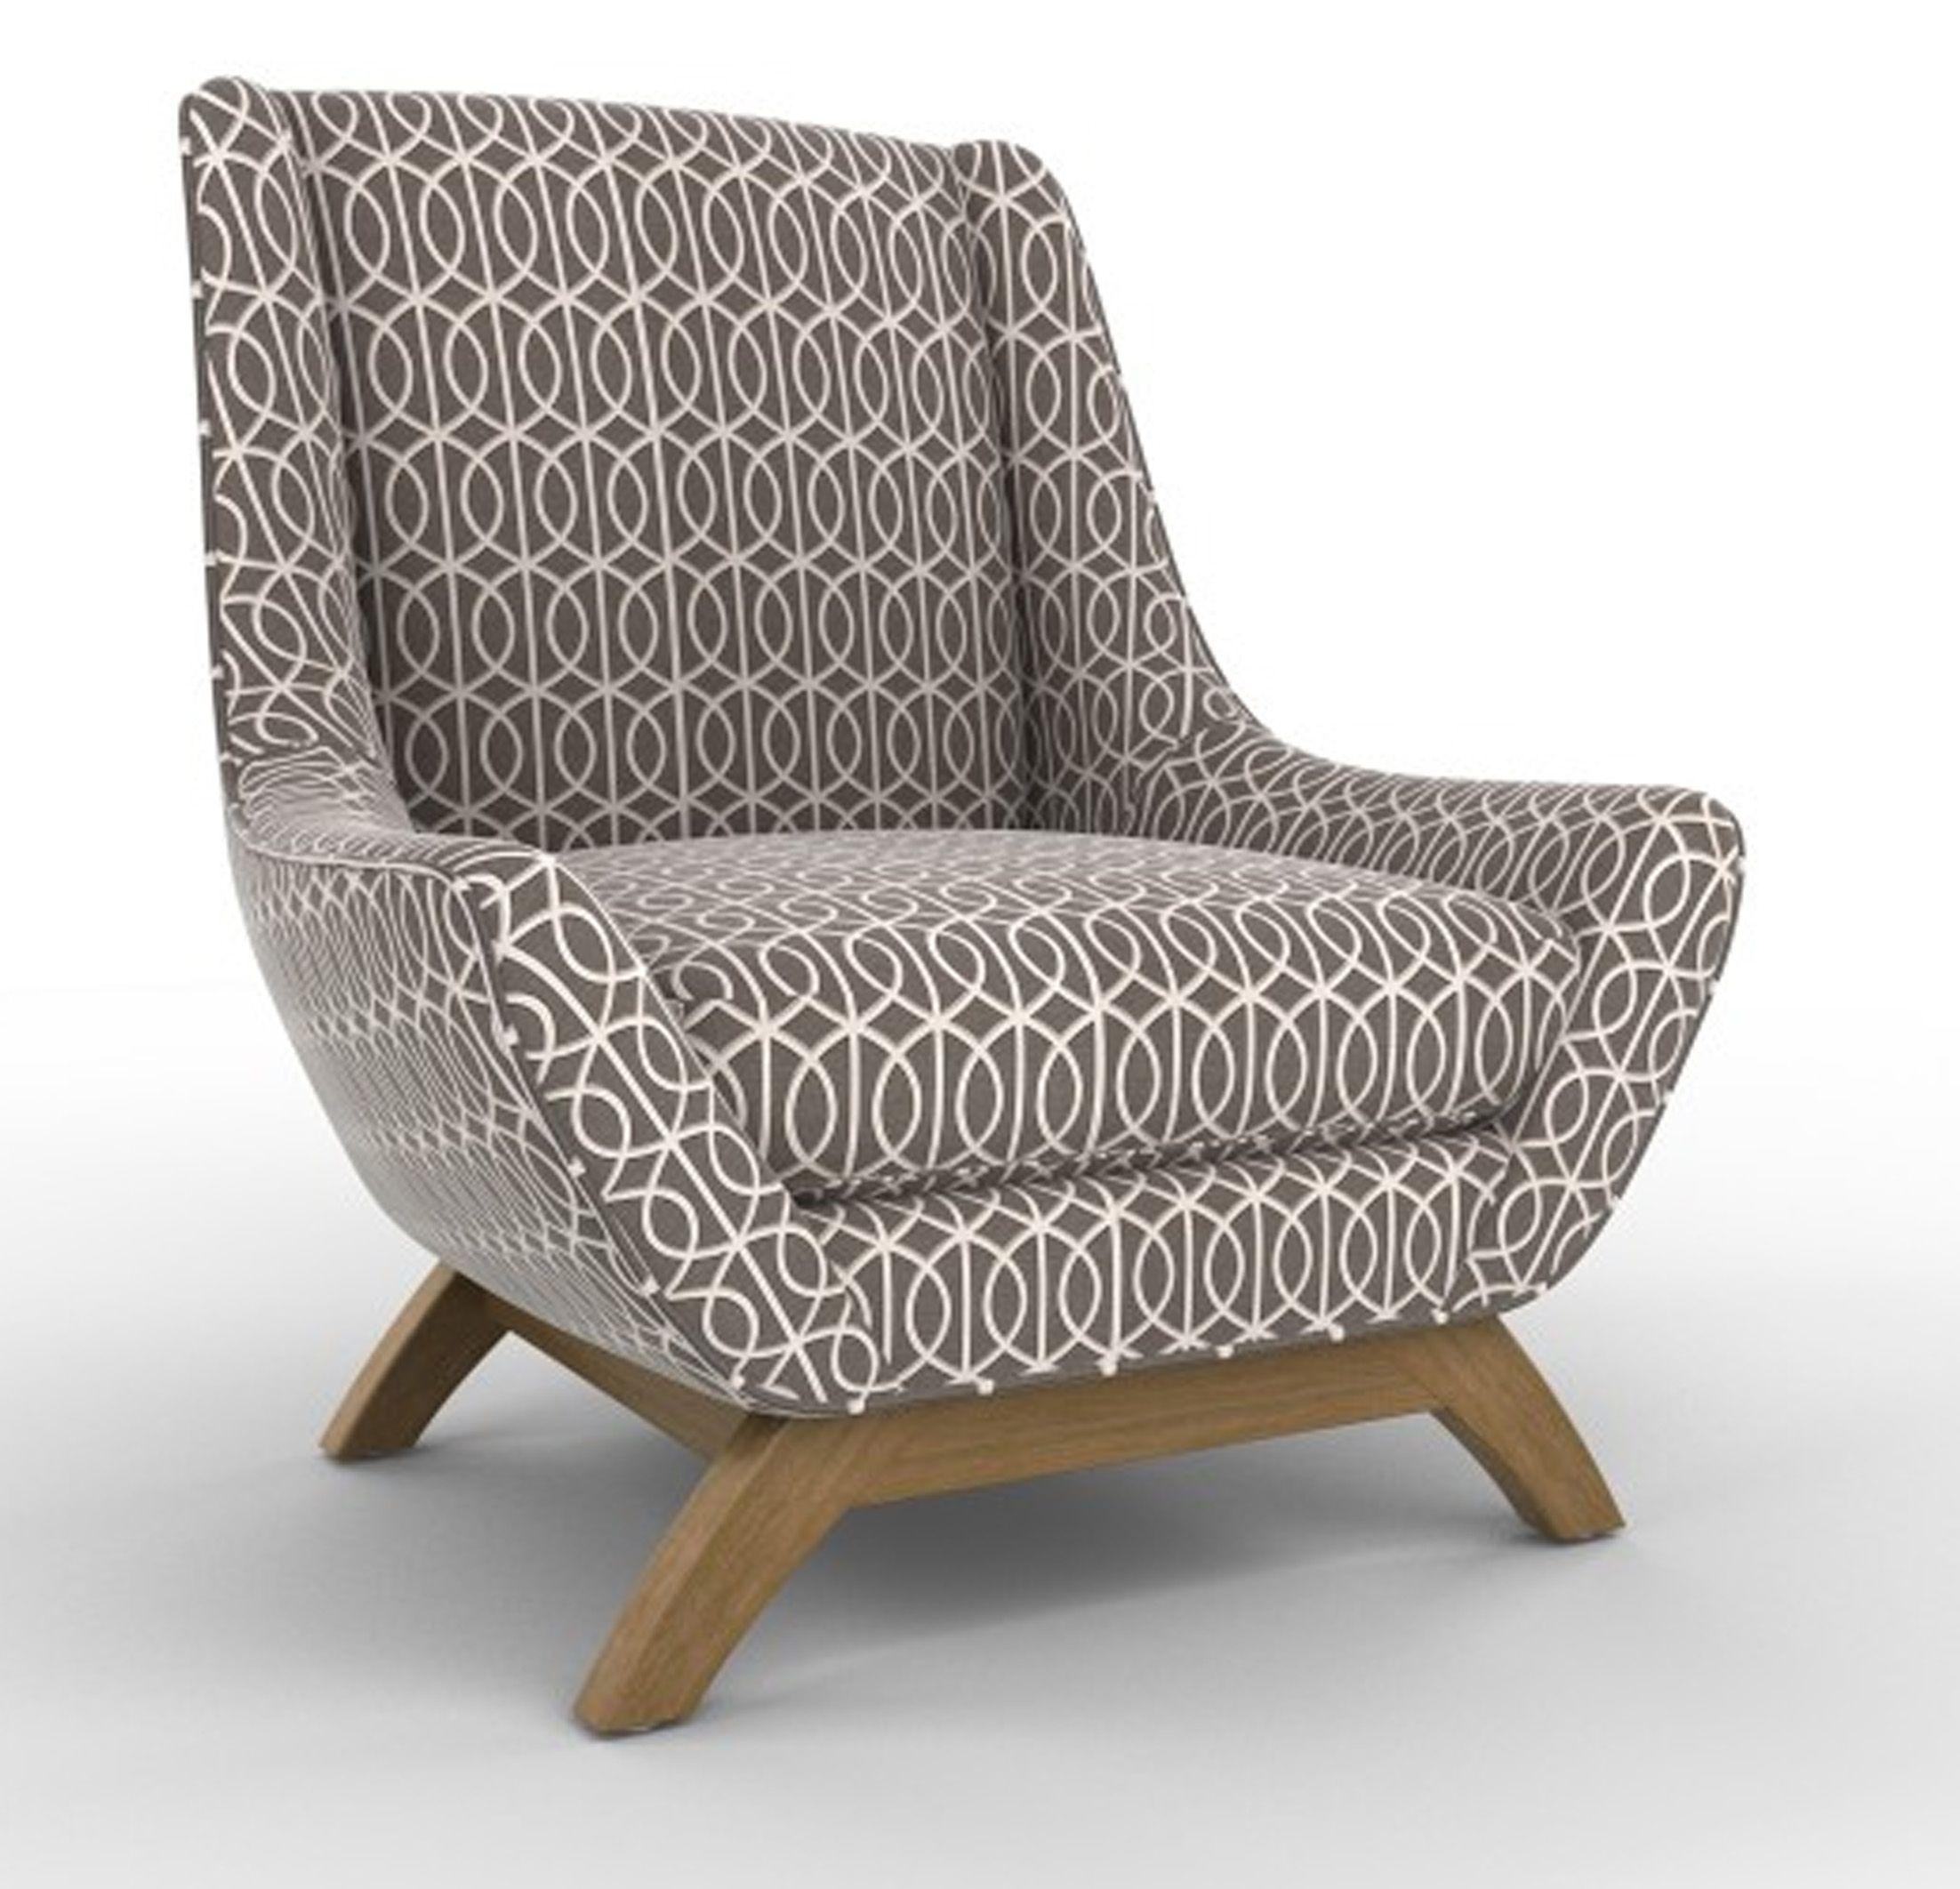 tissu fauteuil recherche google objet meuble tissu. Black Bedroom Furniture Sets. Home Design Ideas